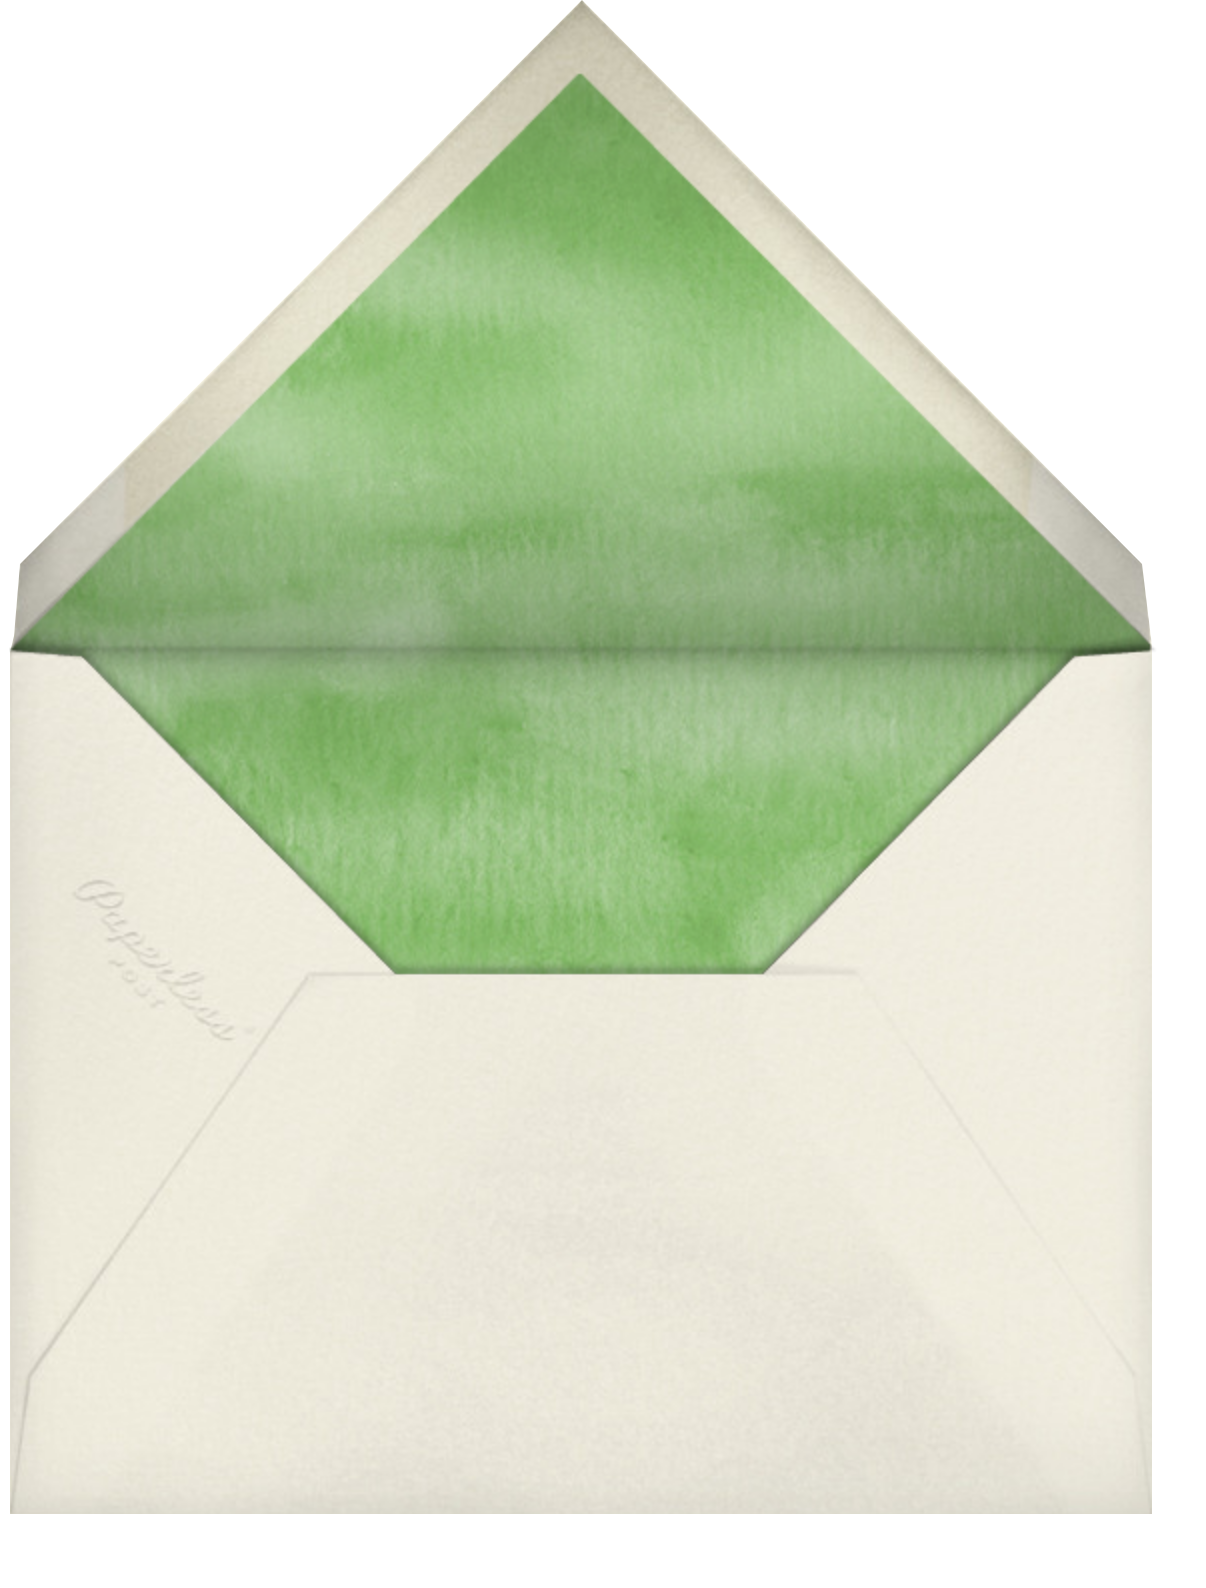 Eureka Bower - Felix Doolittle - Thank you - envelope back